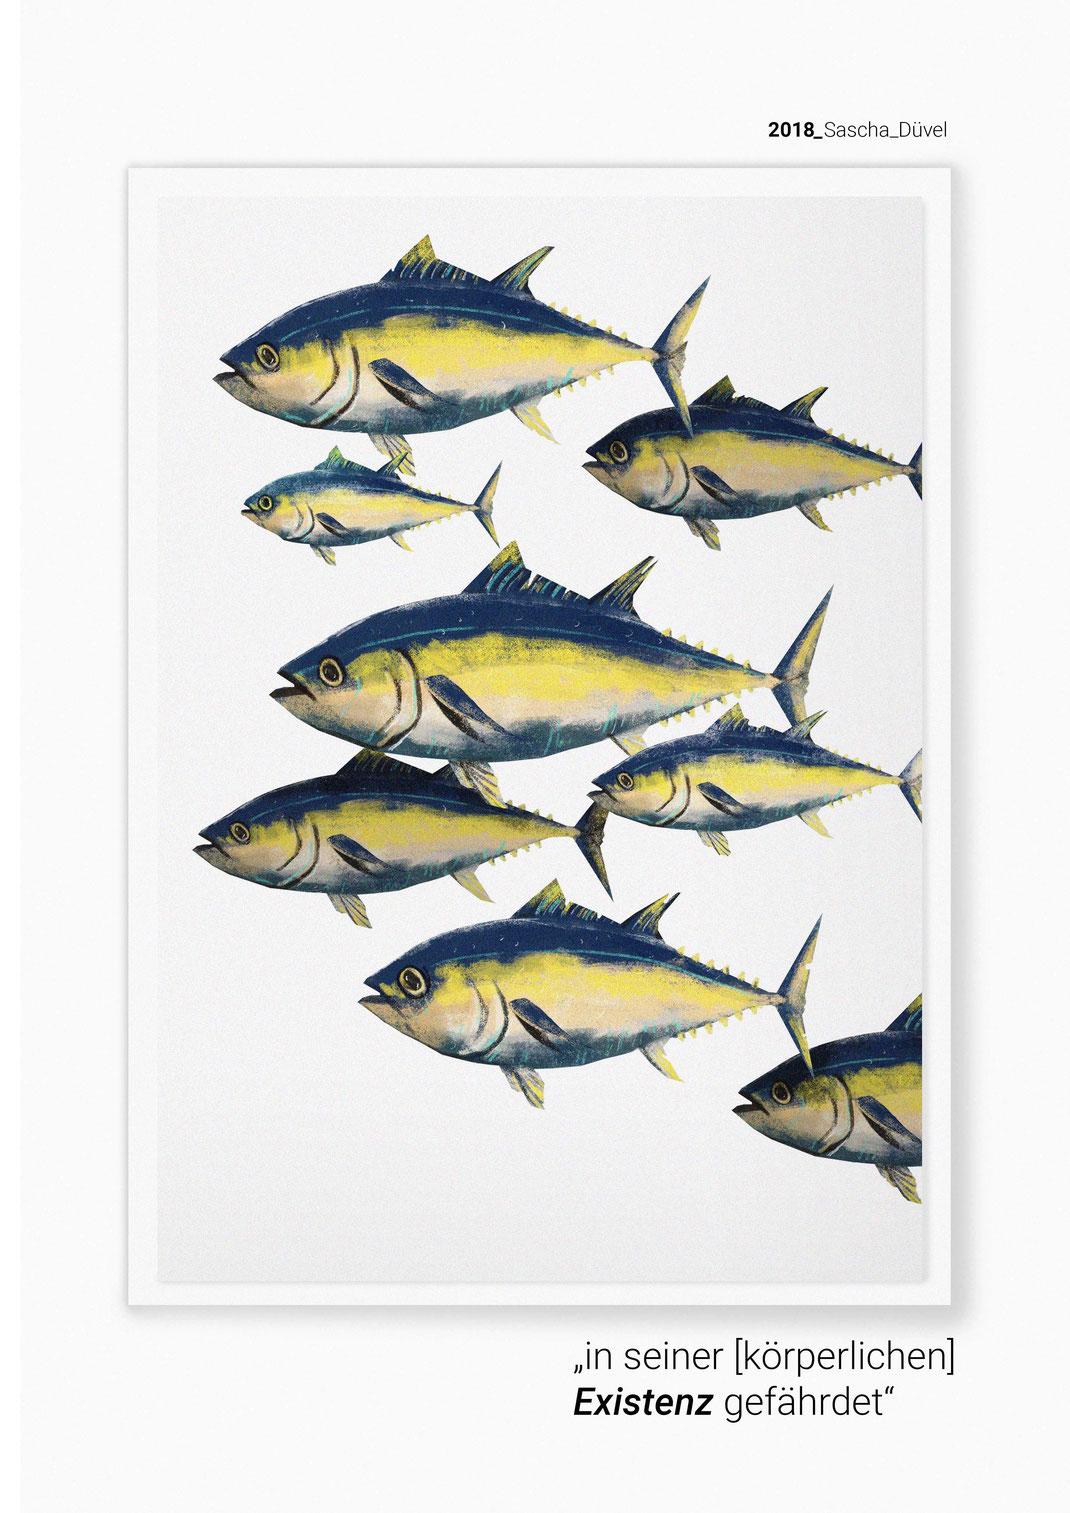 southern bluefin tuna - Thunnus maccoyii